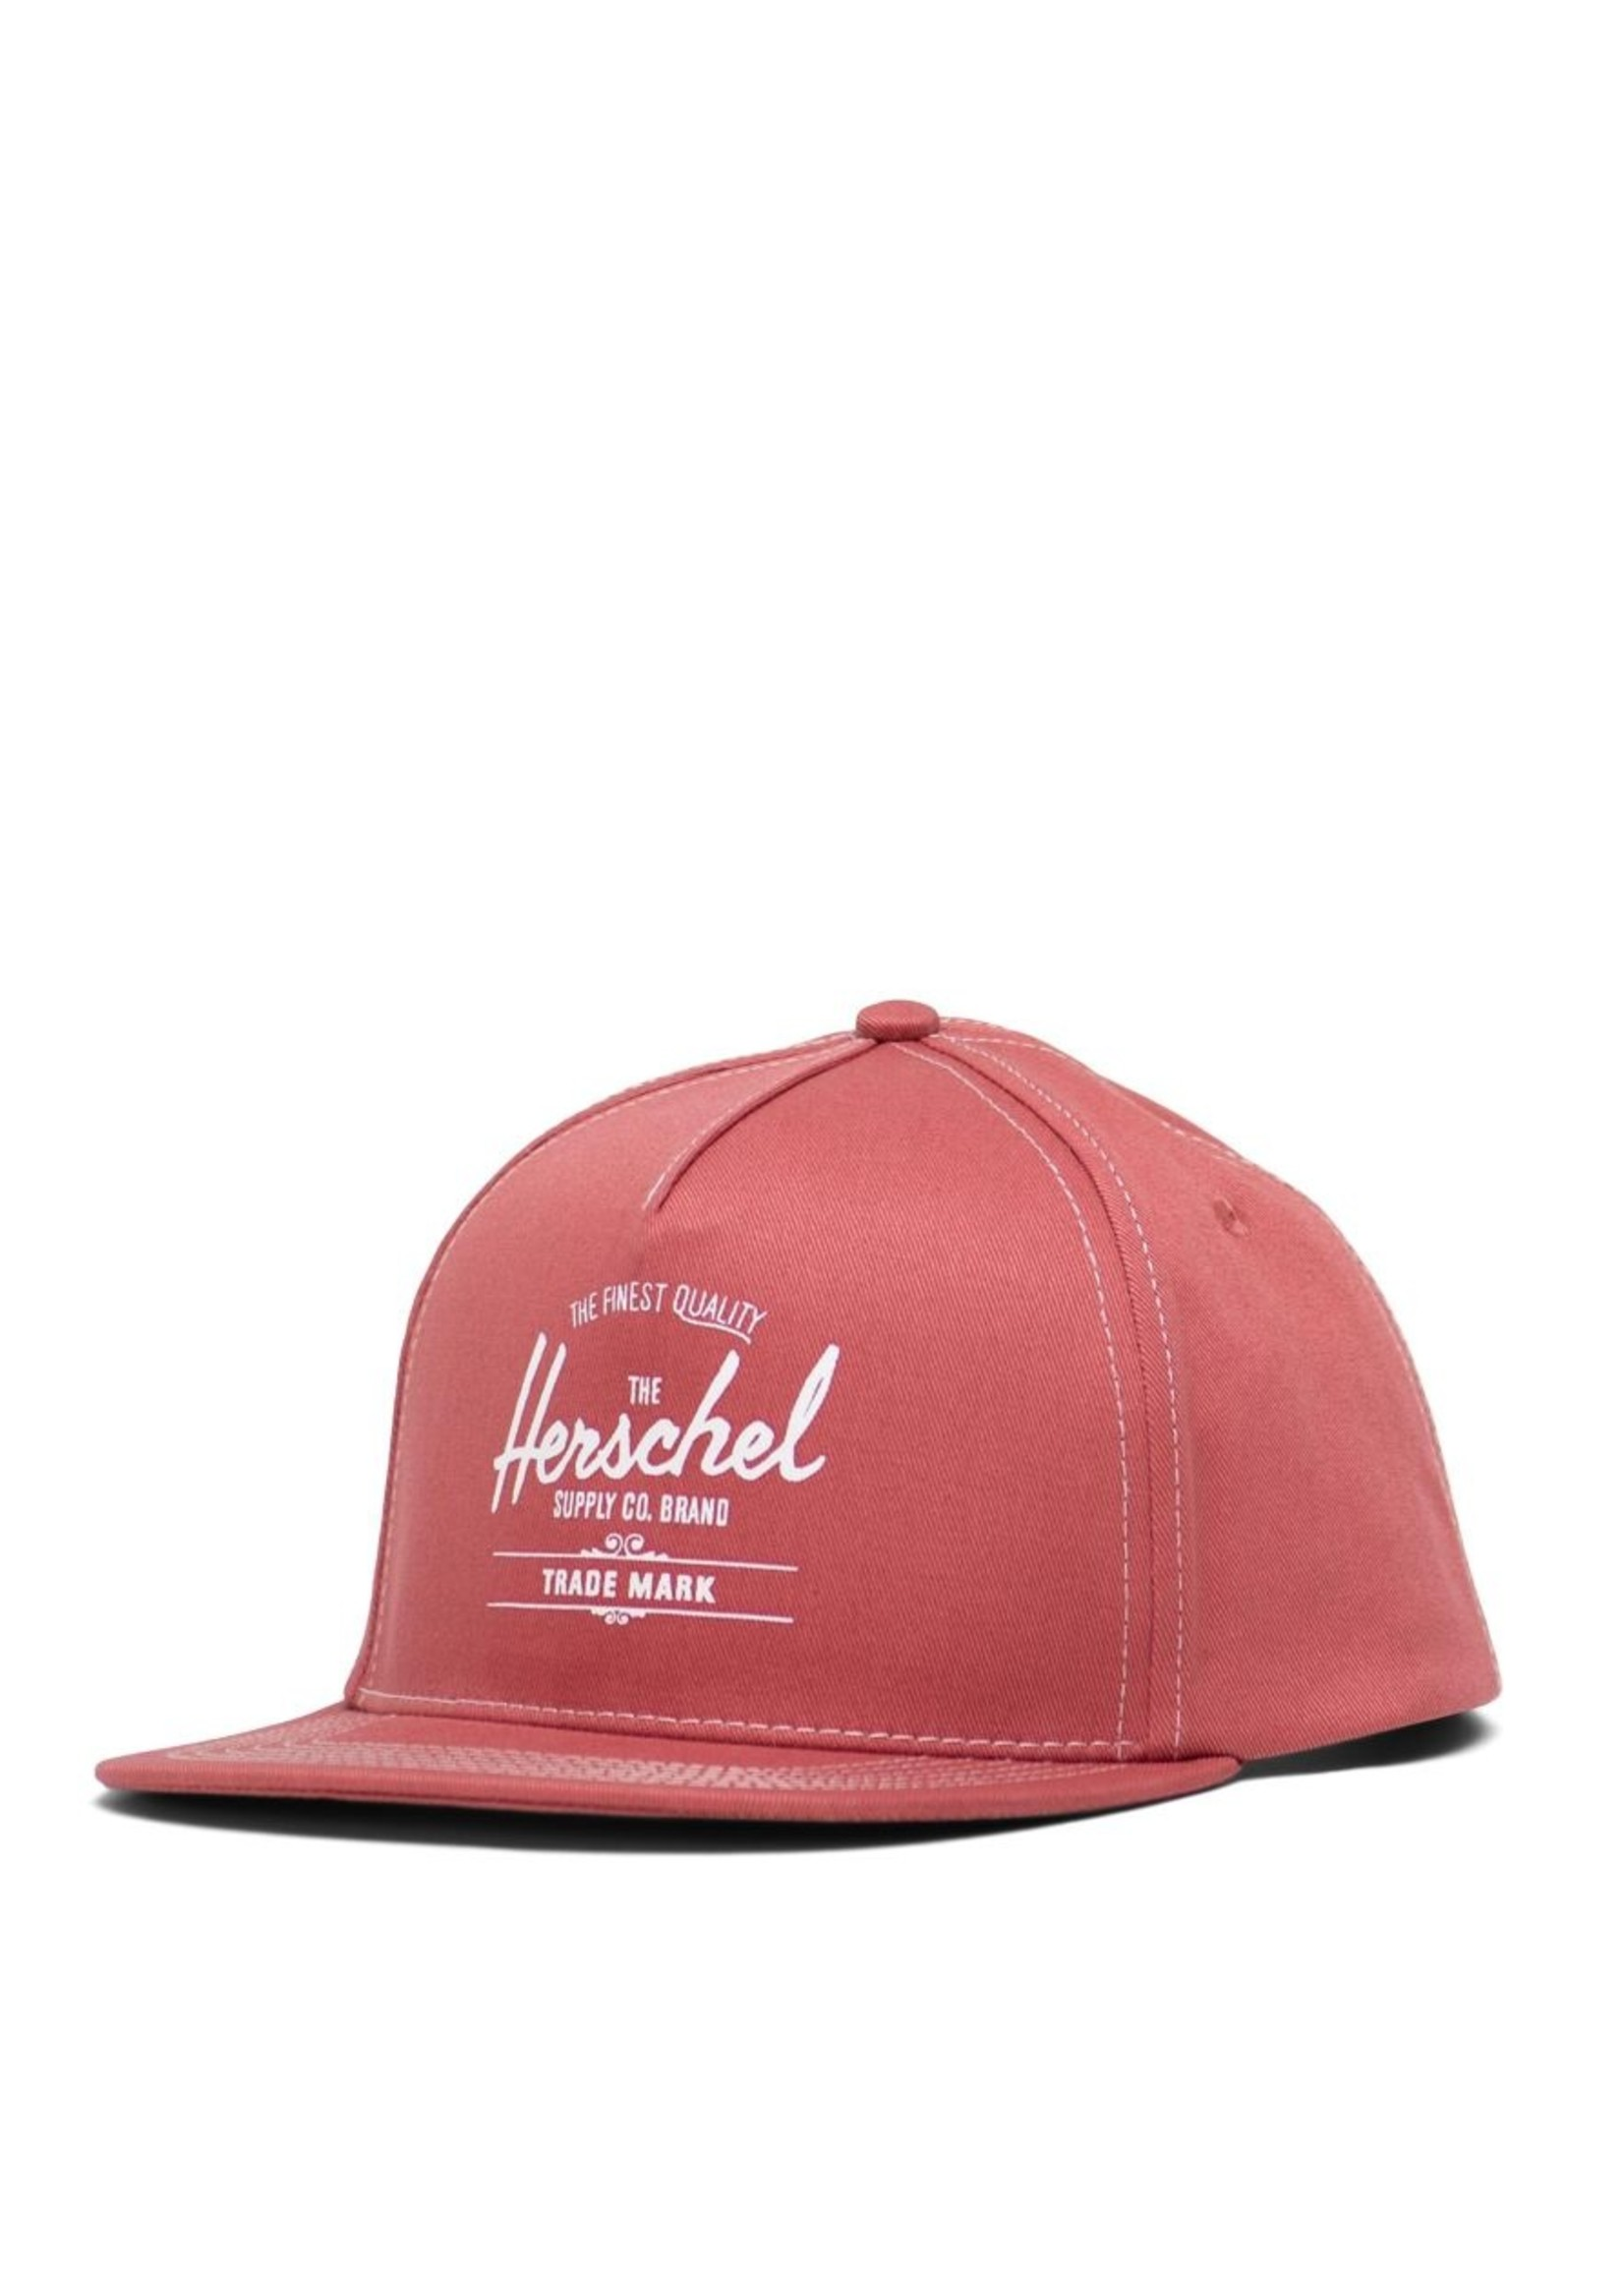 HERSCHEL SUPPLY CO. HERSCHEL WHALER COTTON CAP